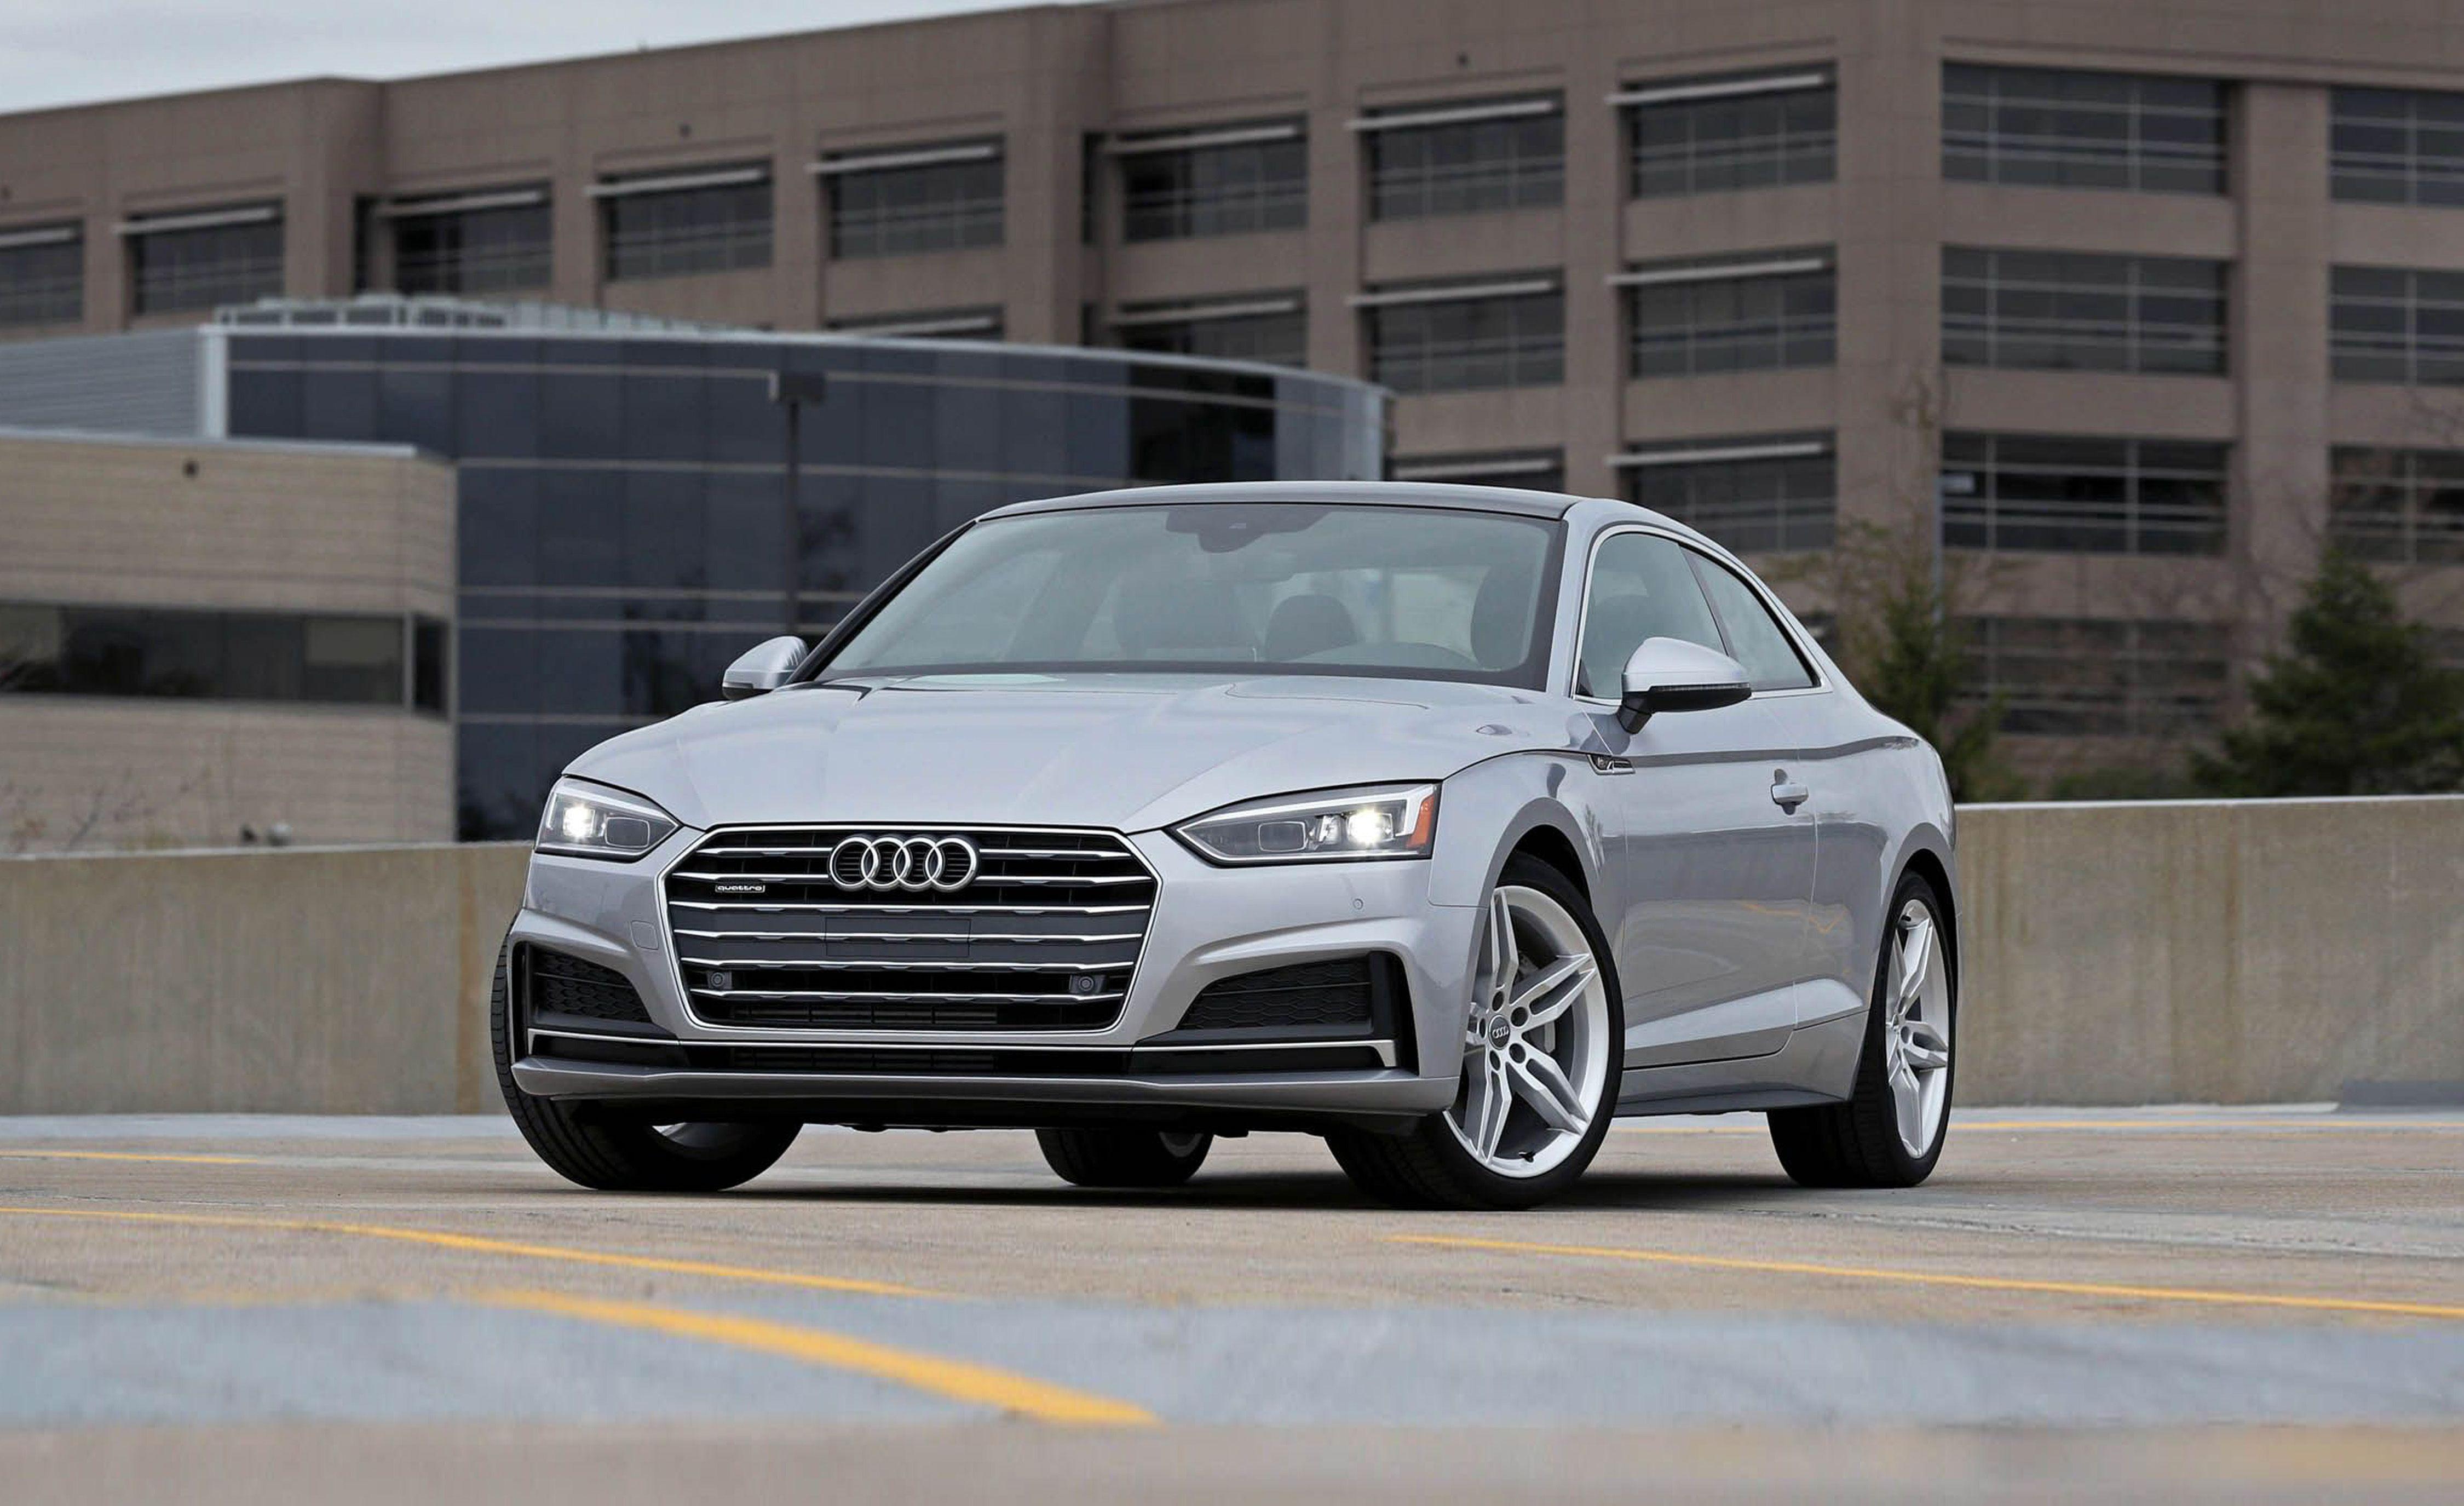 2019 Audi A5 Reviews   Audi A5 Price, Photos, and Specs ...